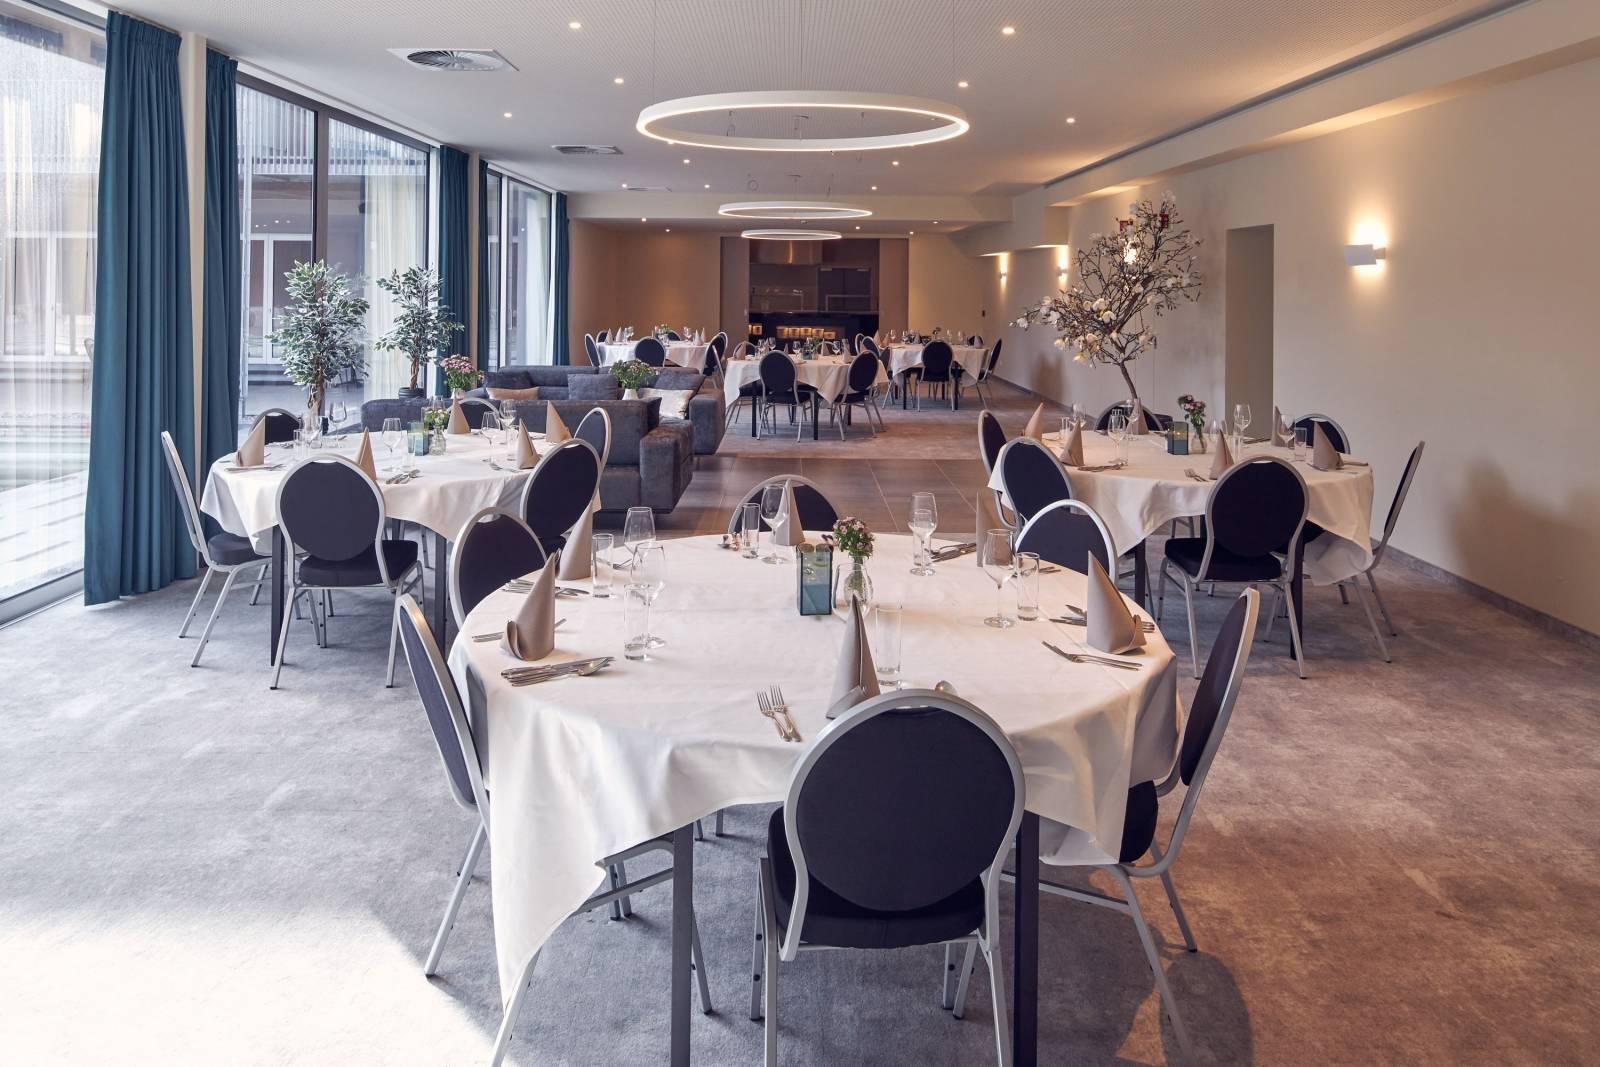 Feestal - Van der Valk hotel Mechelen - House of Weddings (2)